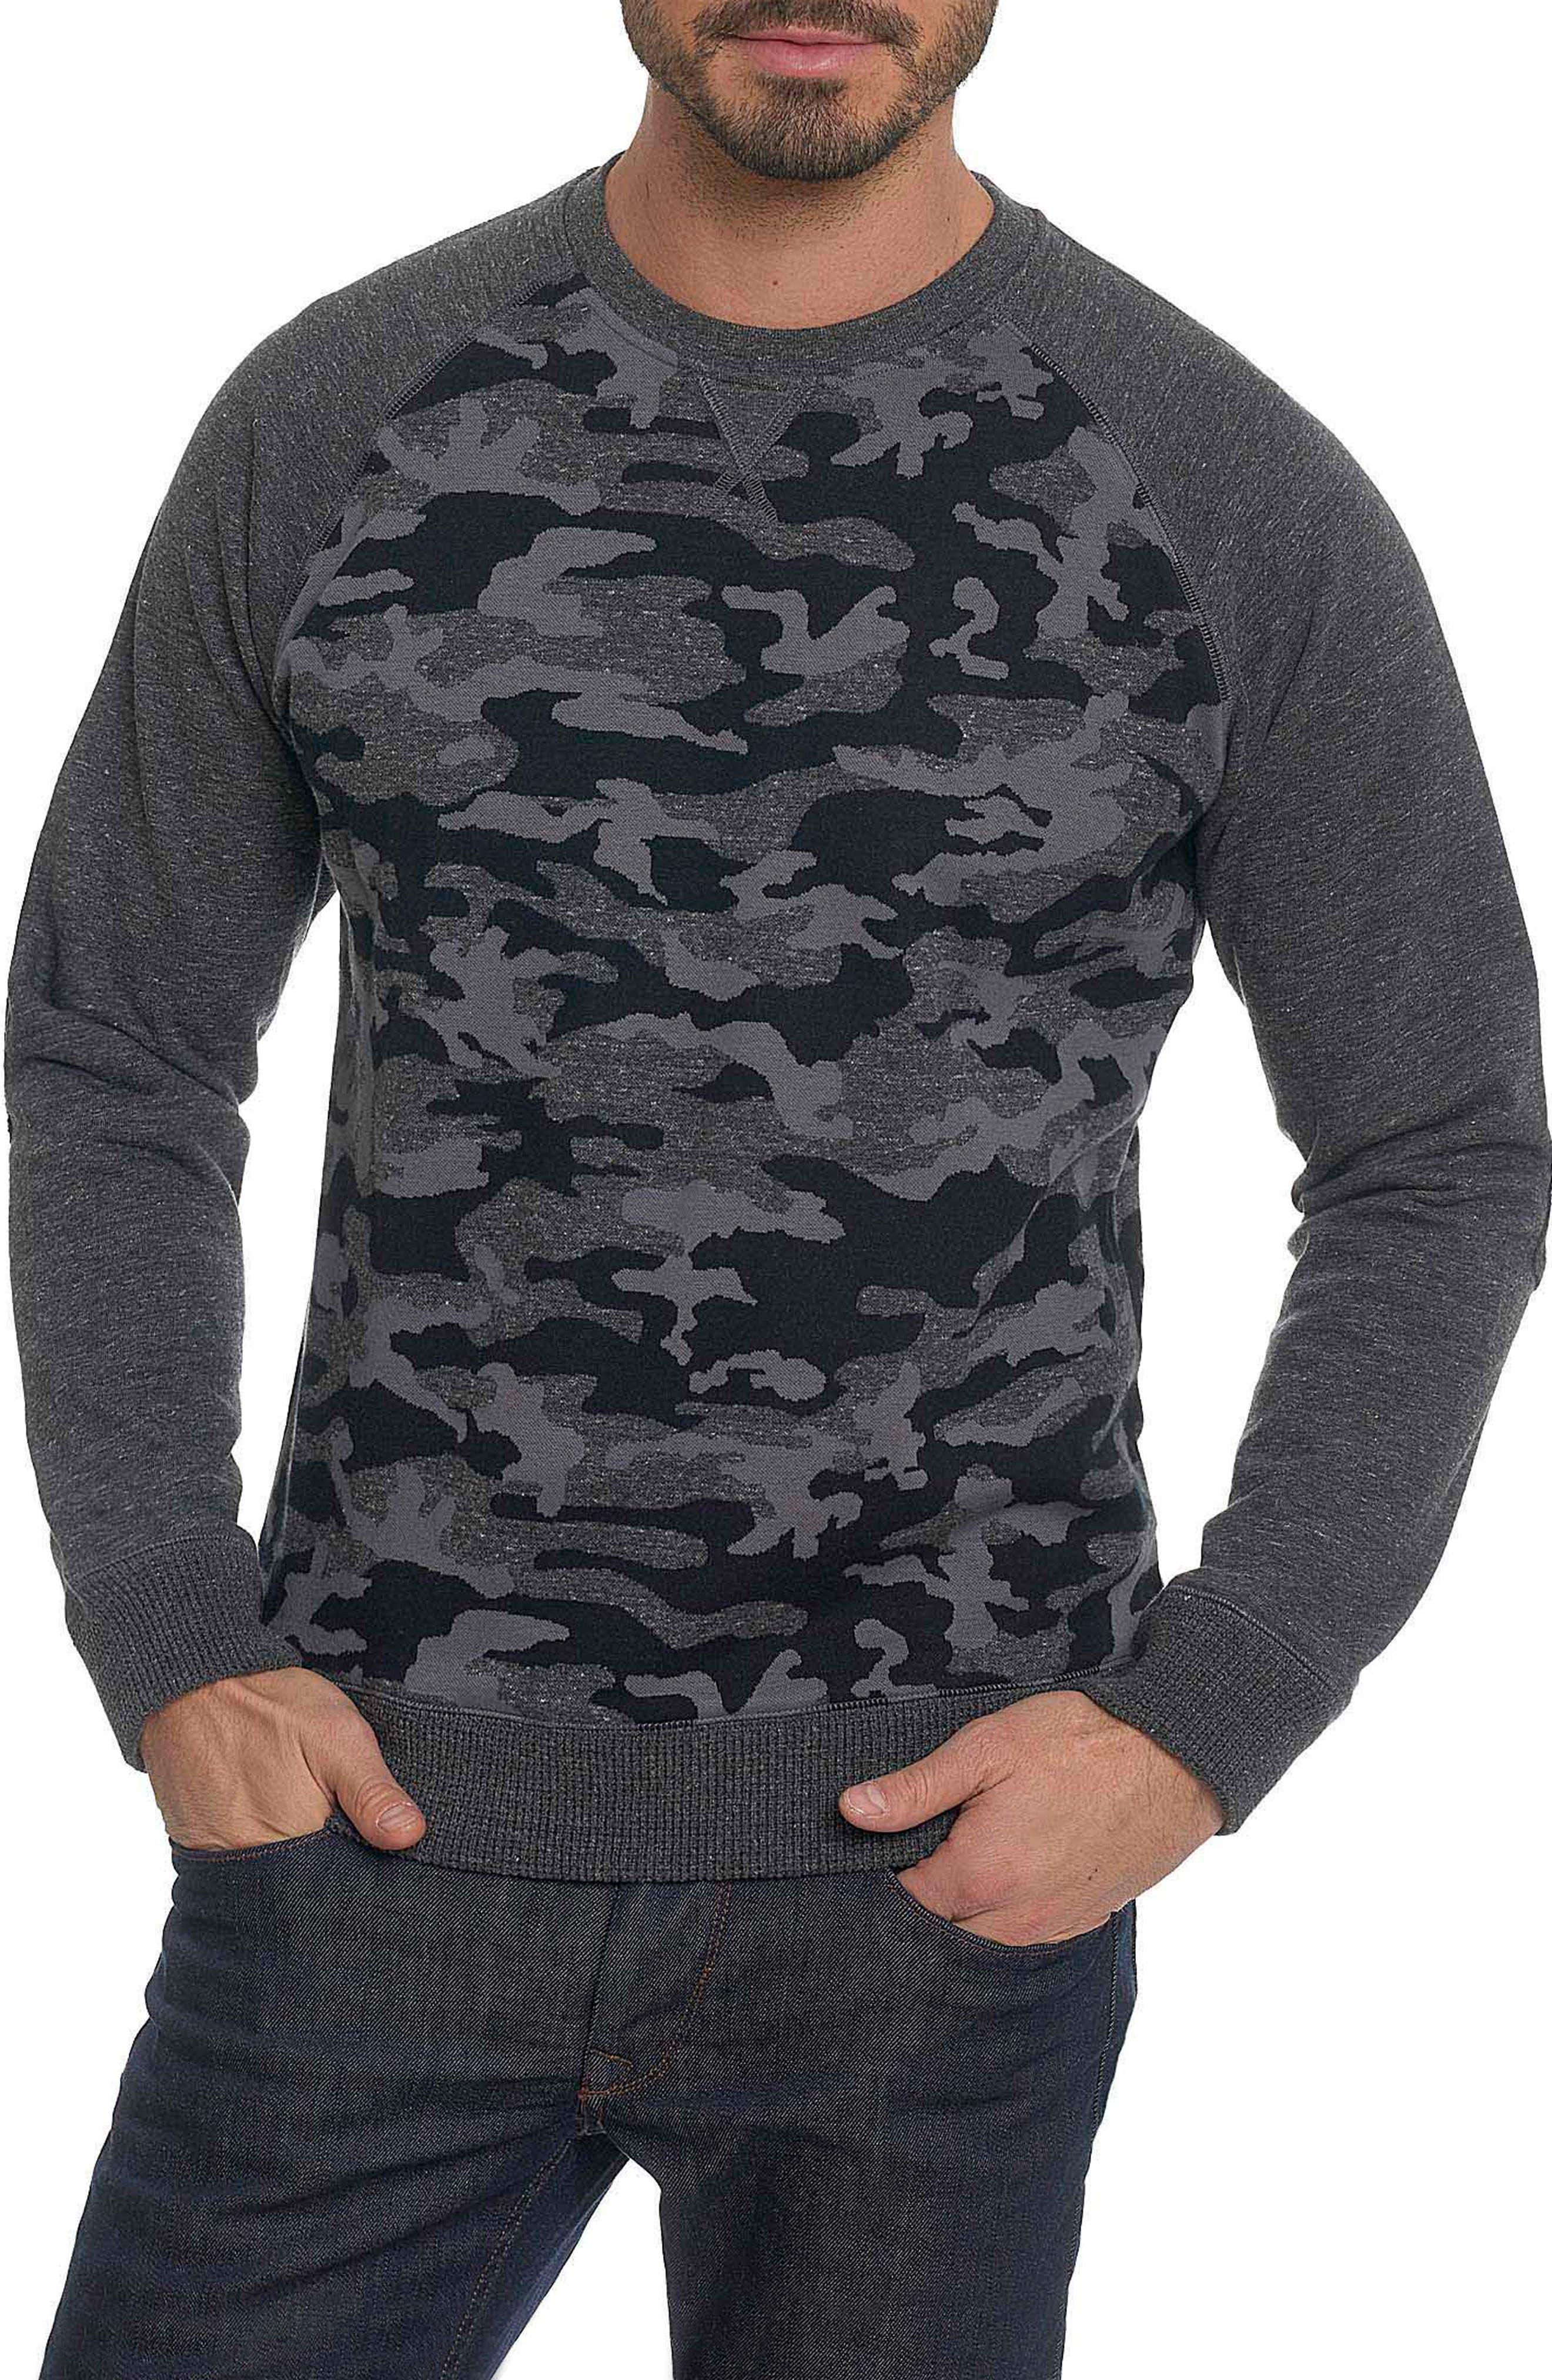 Mooers Camo Raglan Sleeve Shirt,                             Main thumbnail 1, color,                             Charcoal